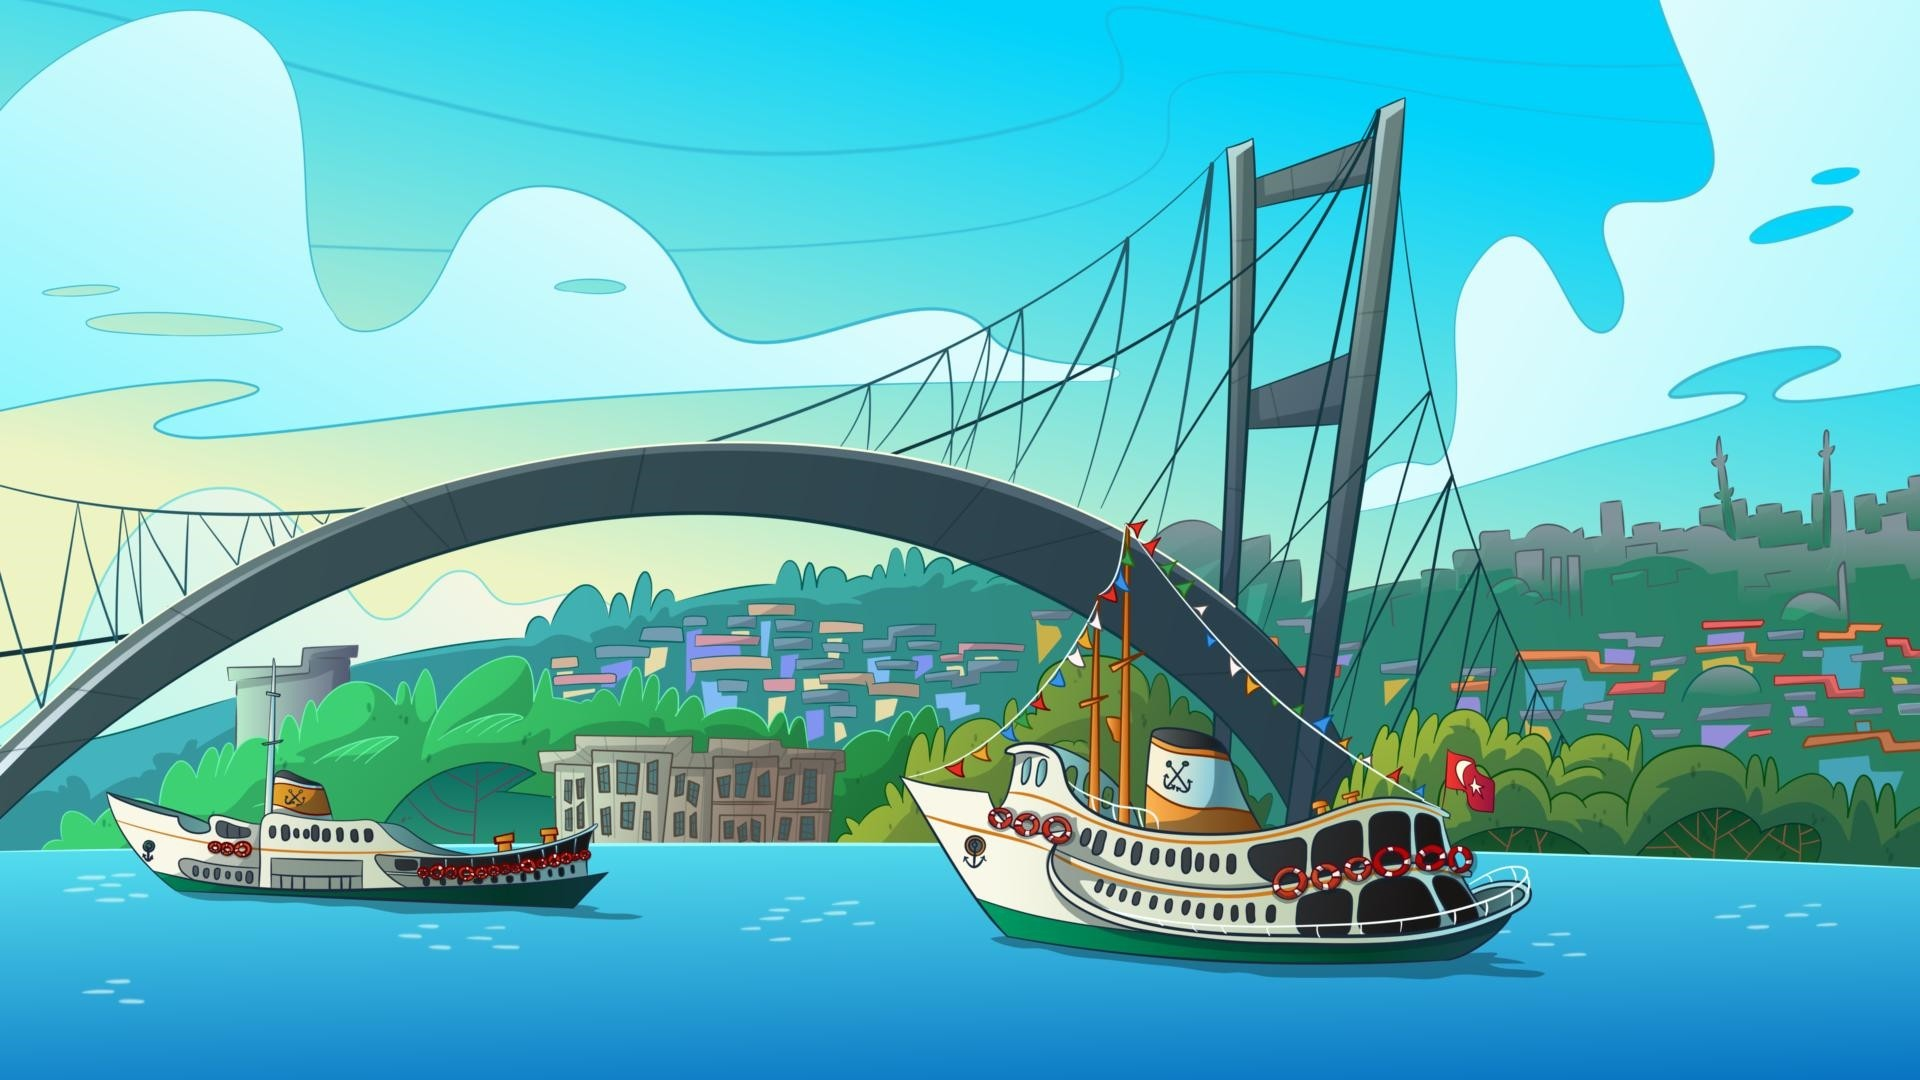 The cartoon TV series, u201cMaceracu0131 Yu00fczgeu00e7ler,u201d prepared by Erhan Korkmaz